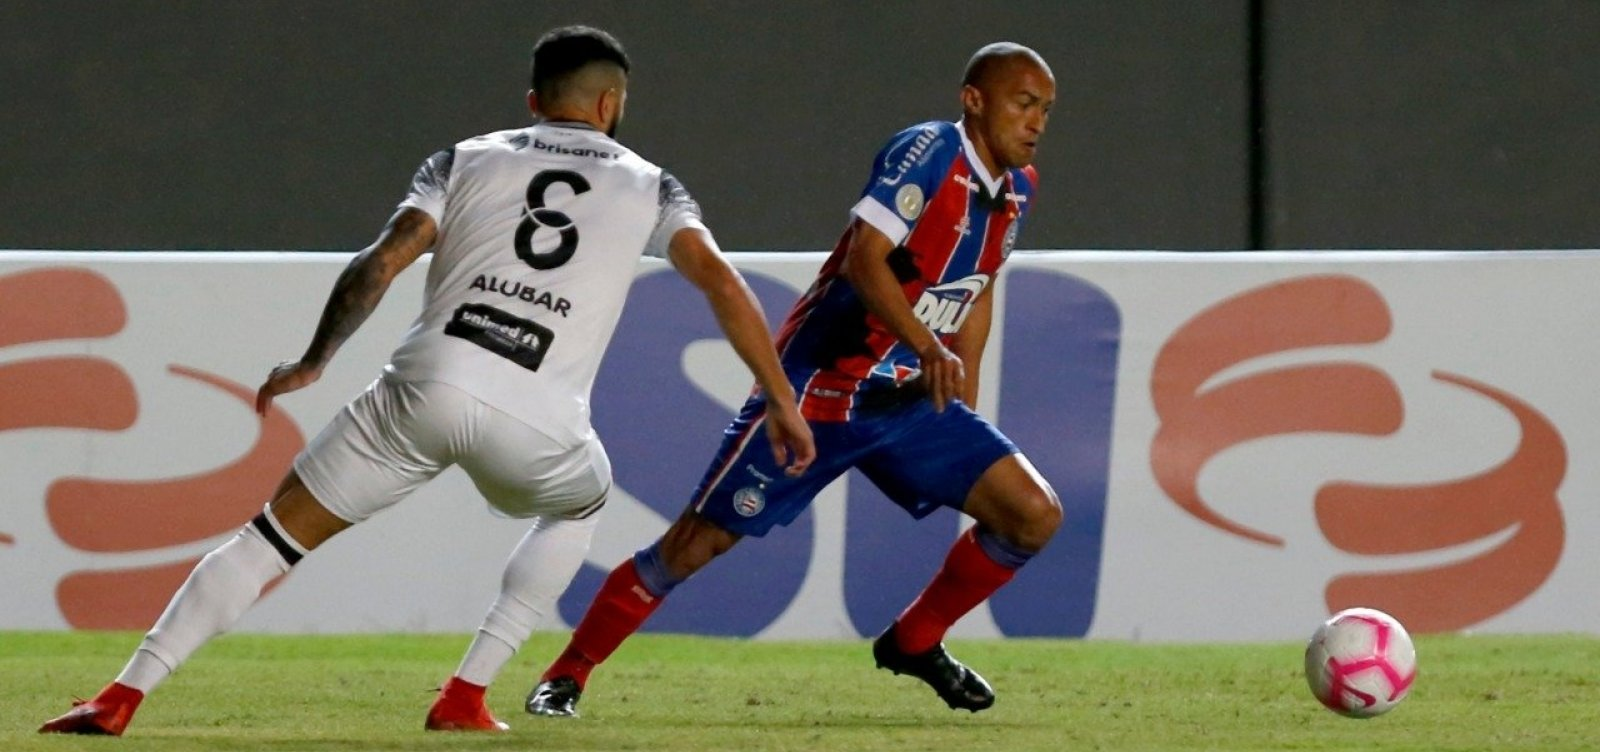 Bahia joga mal e perde de virada por 2 a 1 para o Ceará